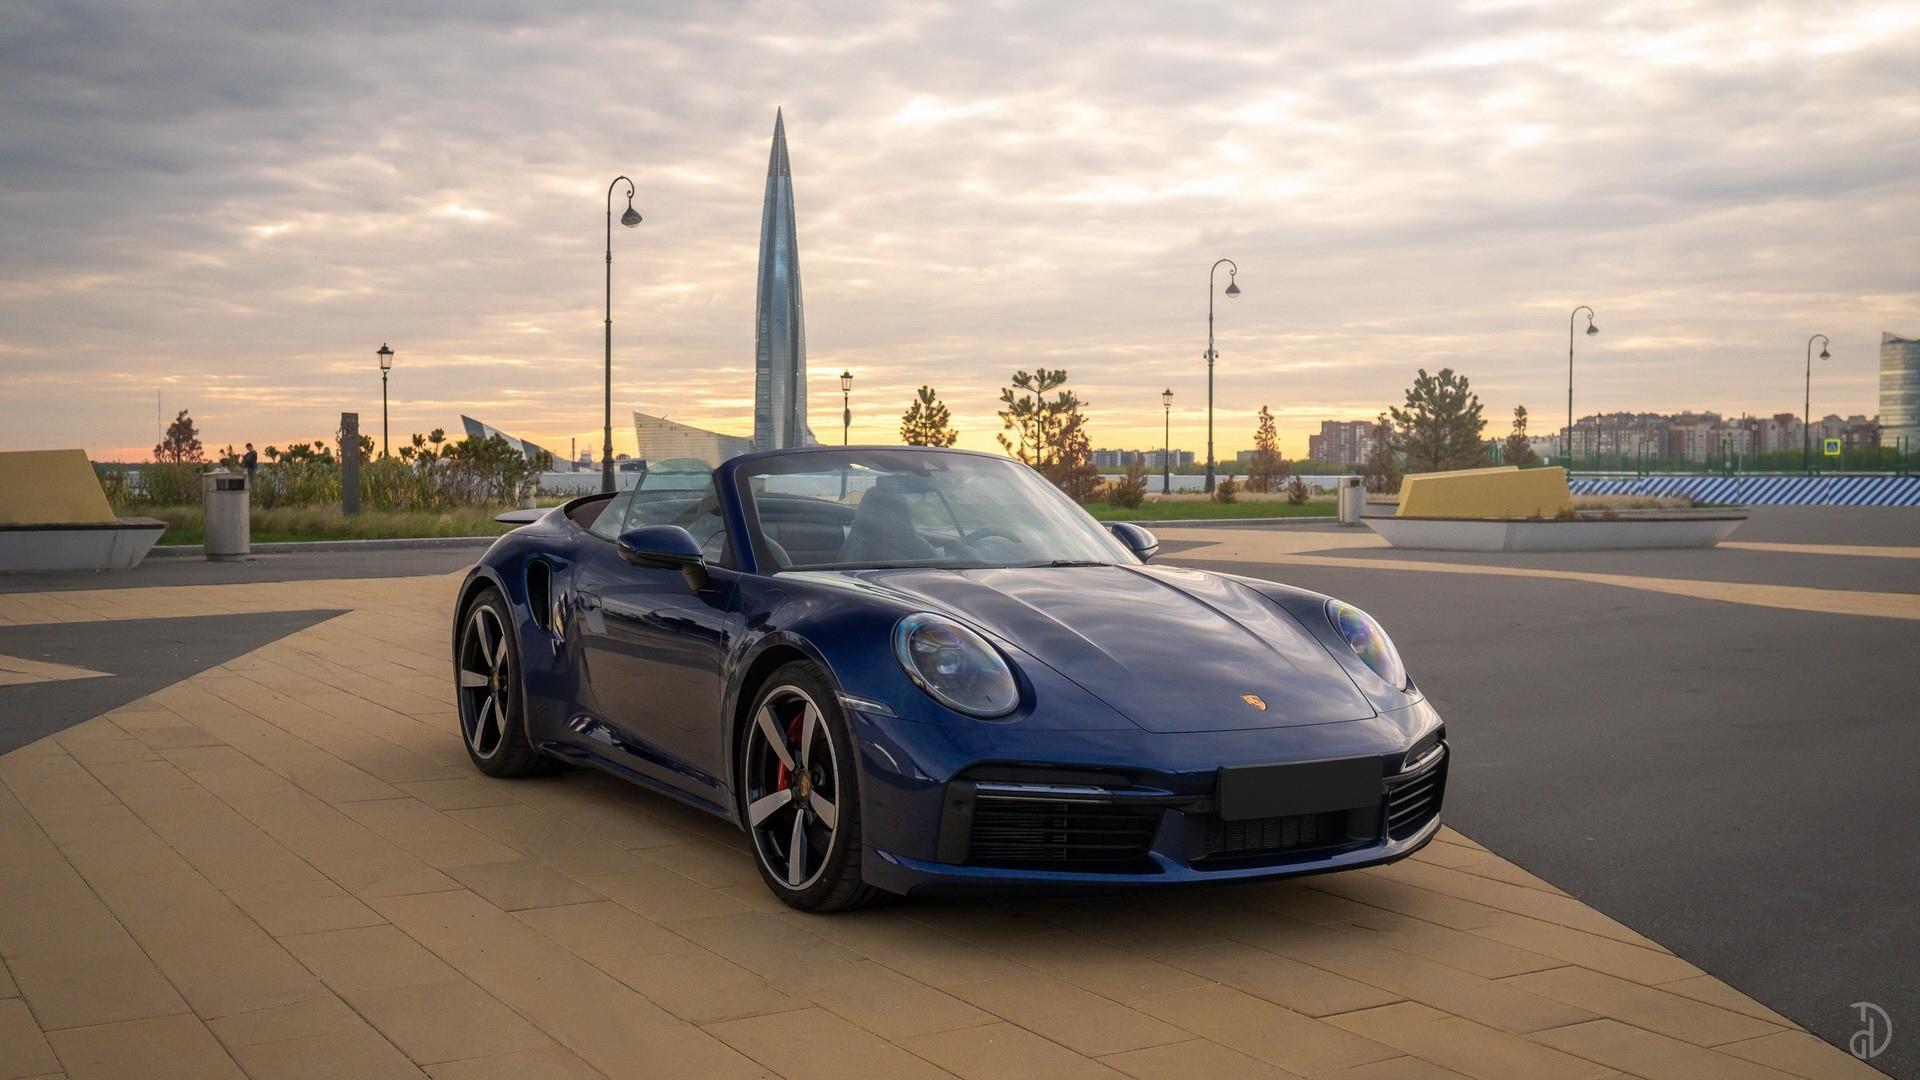 Аренда Porsche 911 Turbo (992) в Сочи. Фото 1